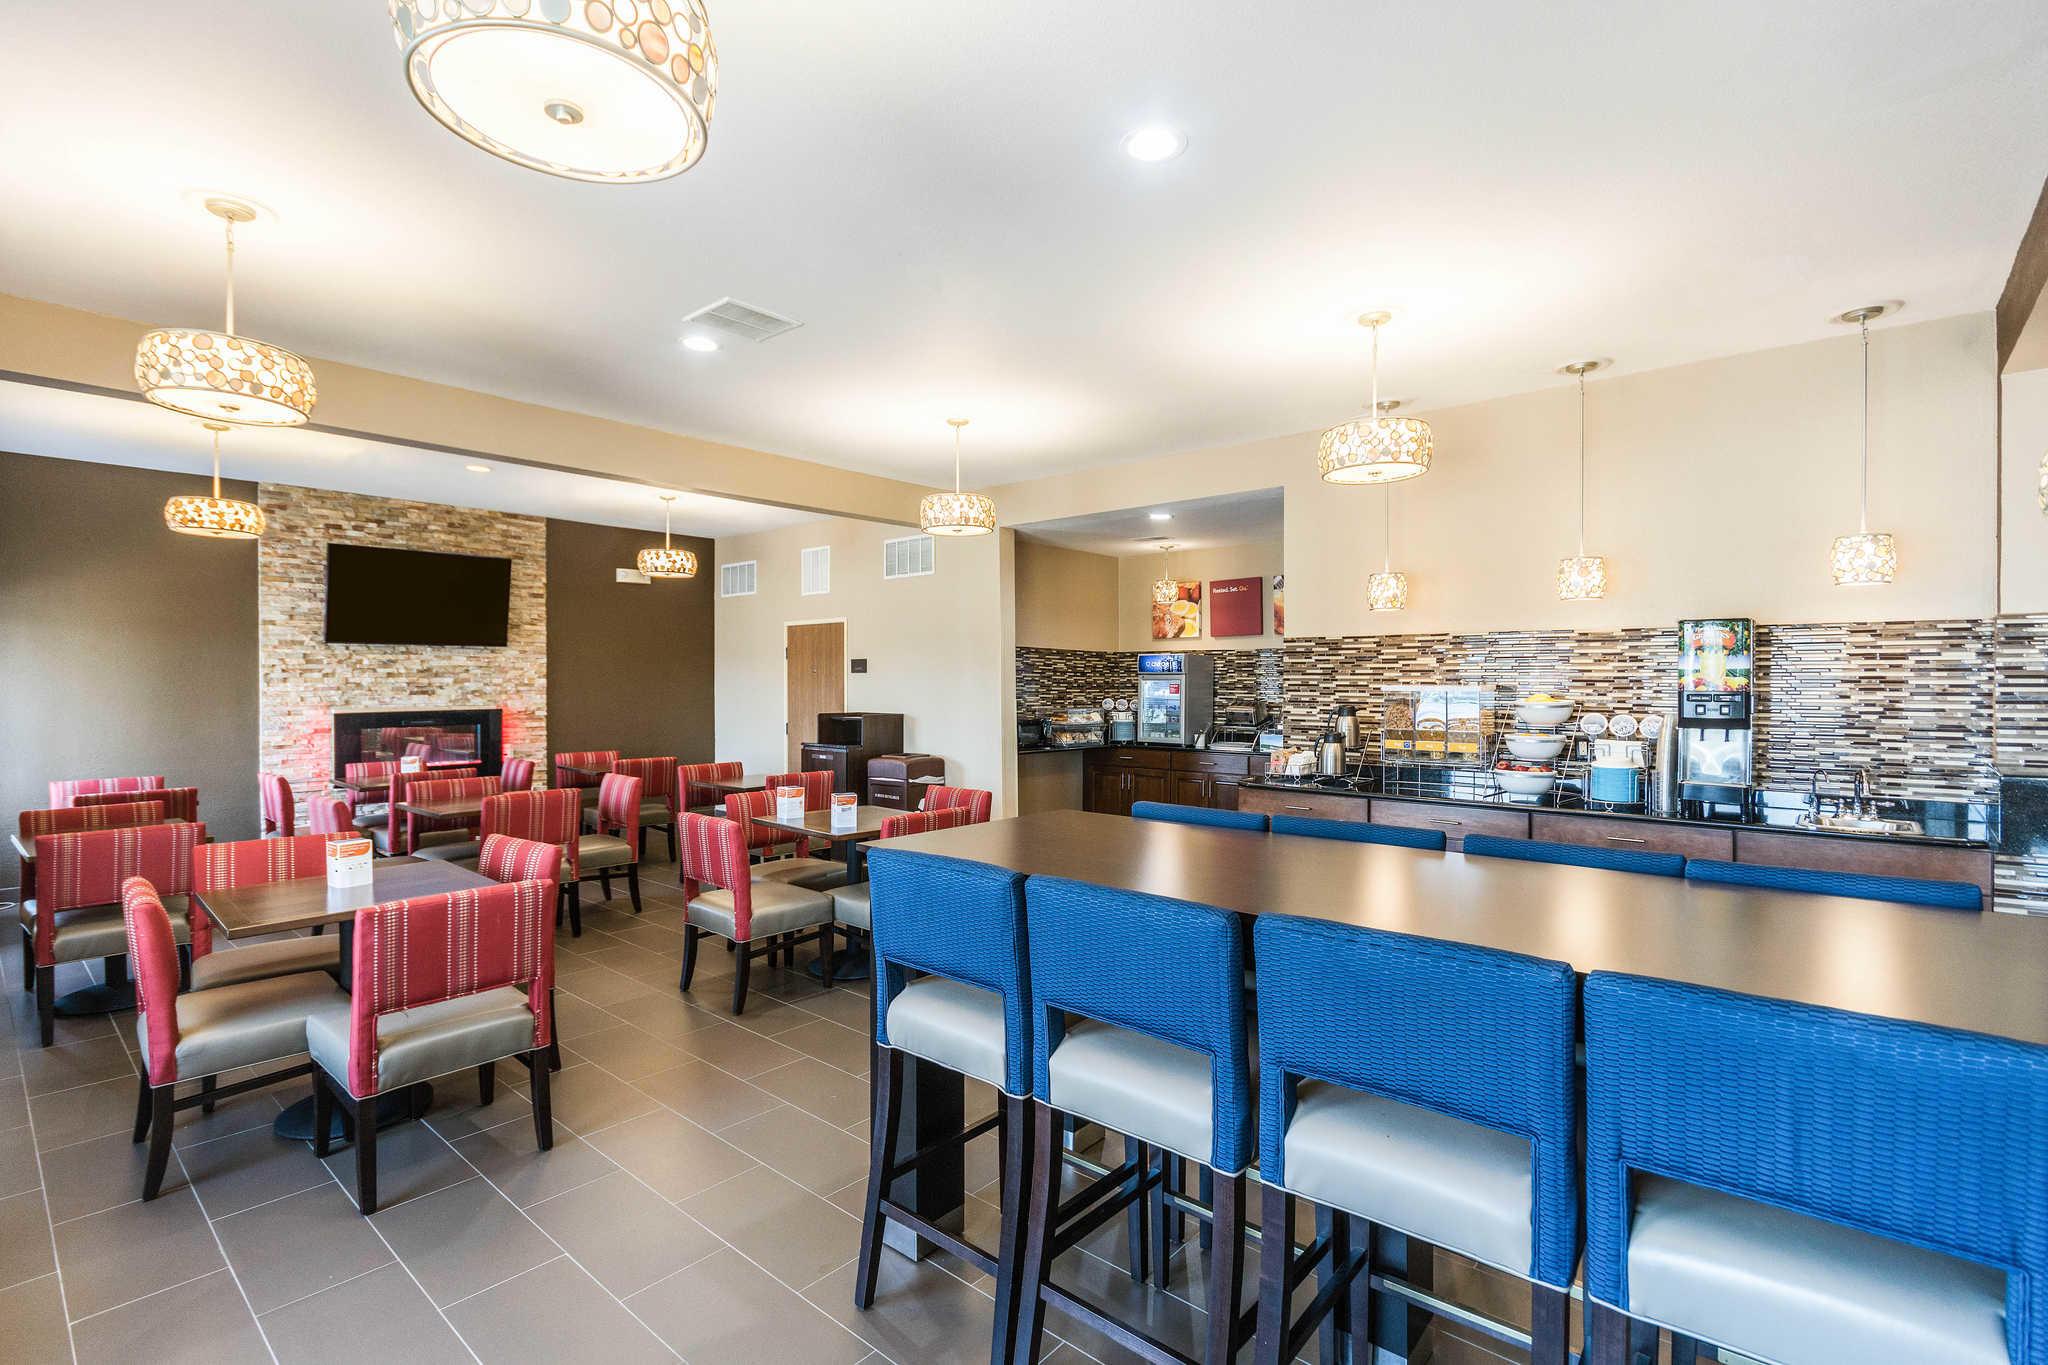 Comfort Inn & Suites North Aurora - Naperville image 33